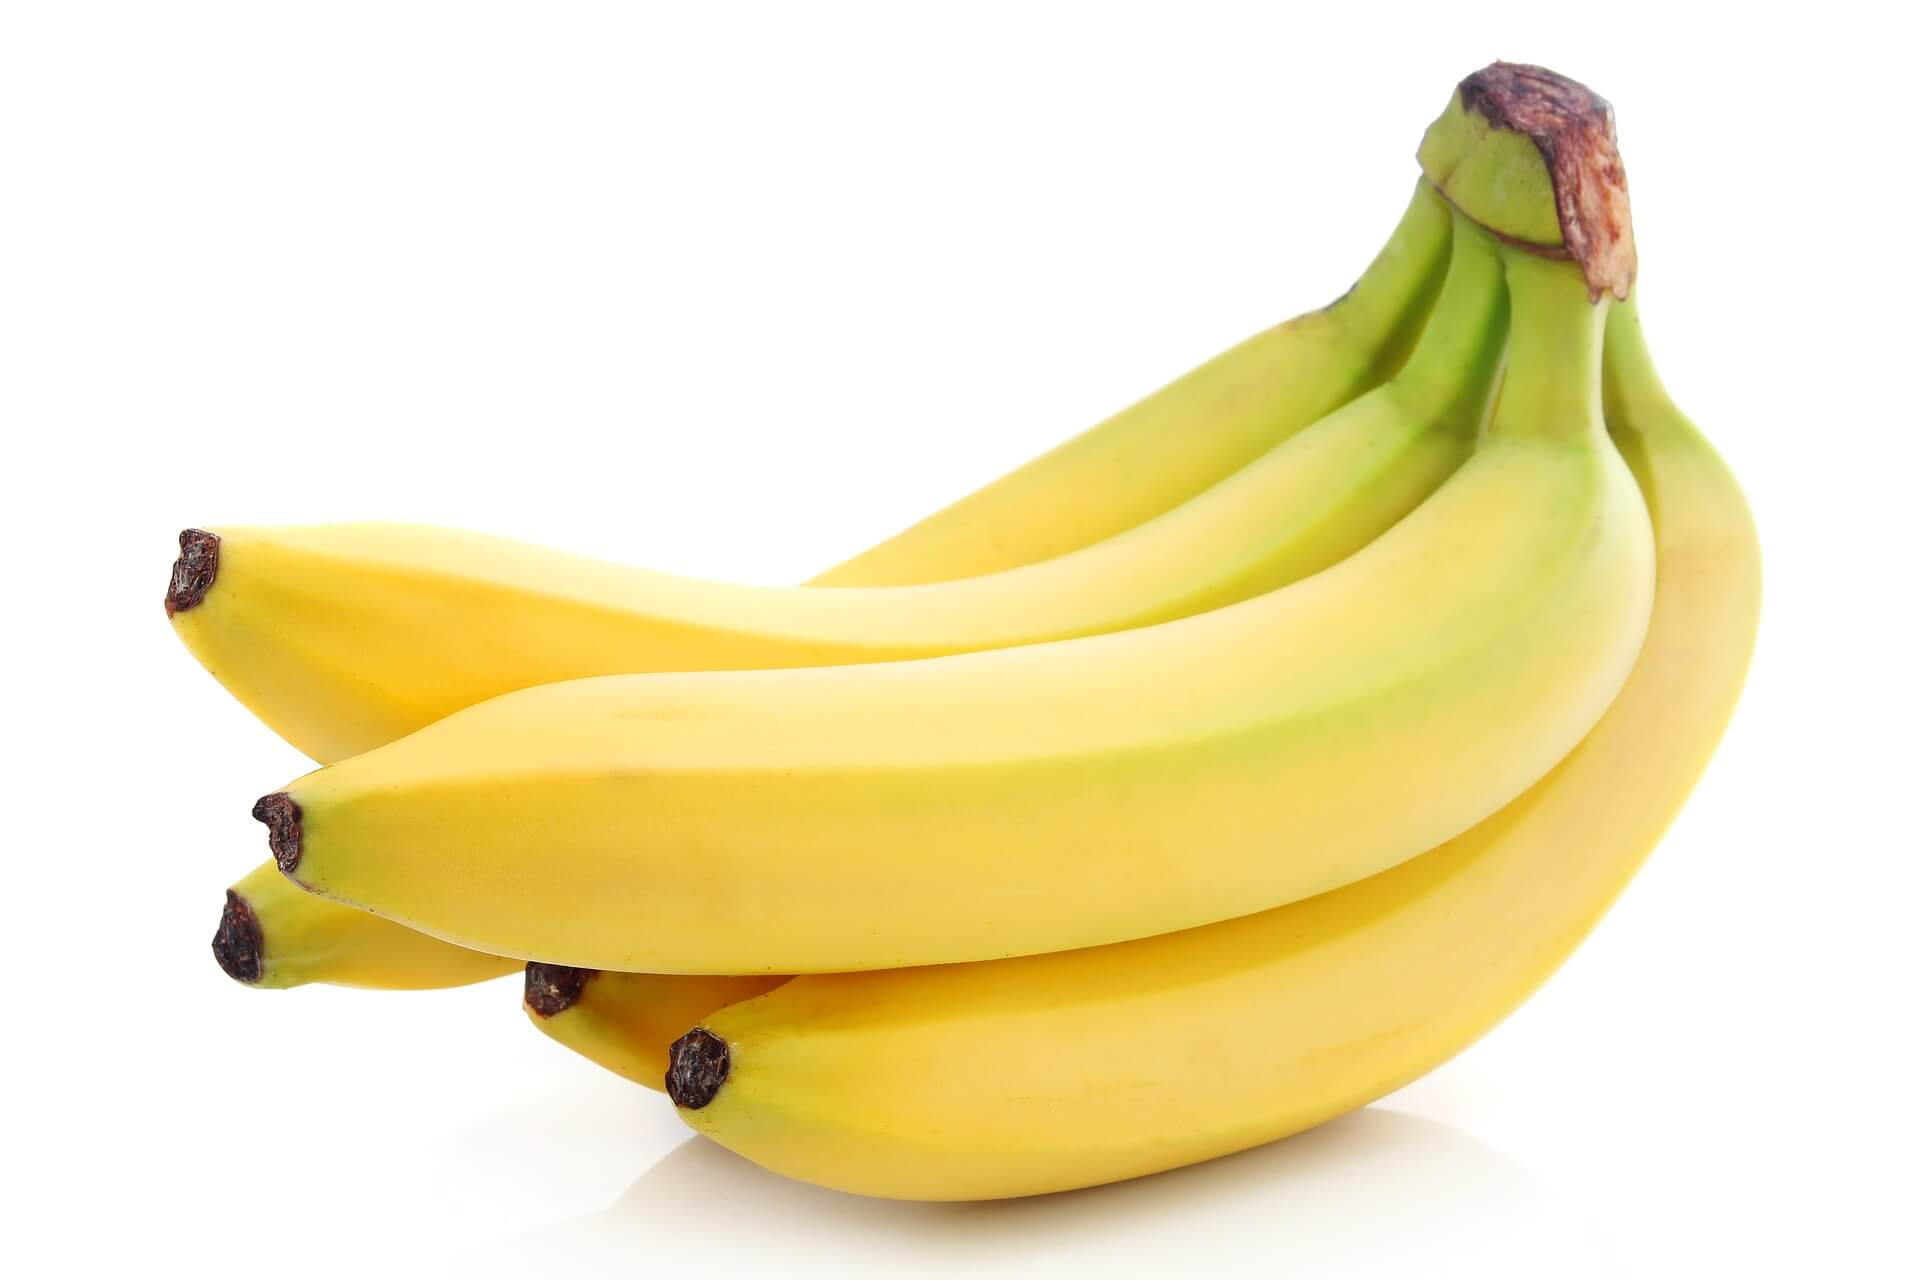 banana-2449019_1920-1.jpg